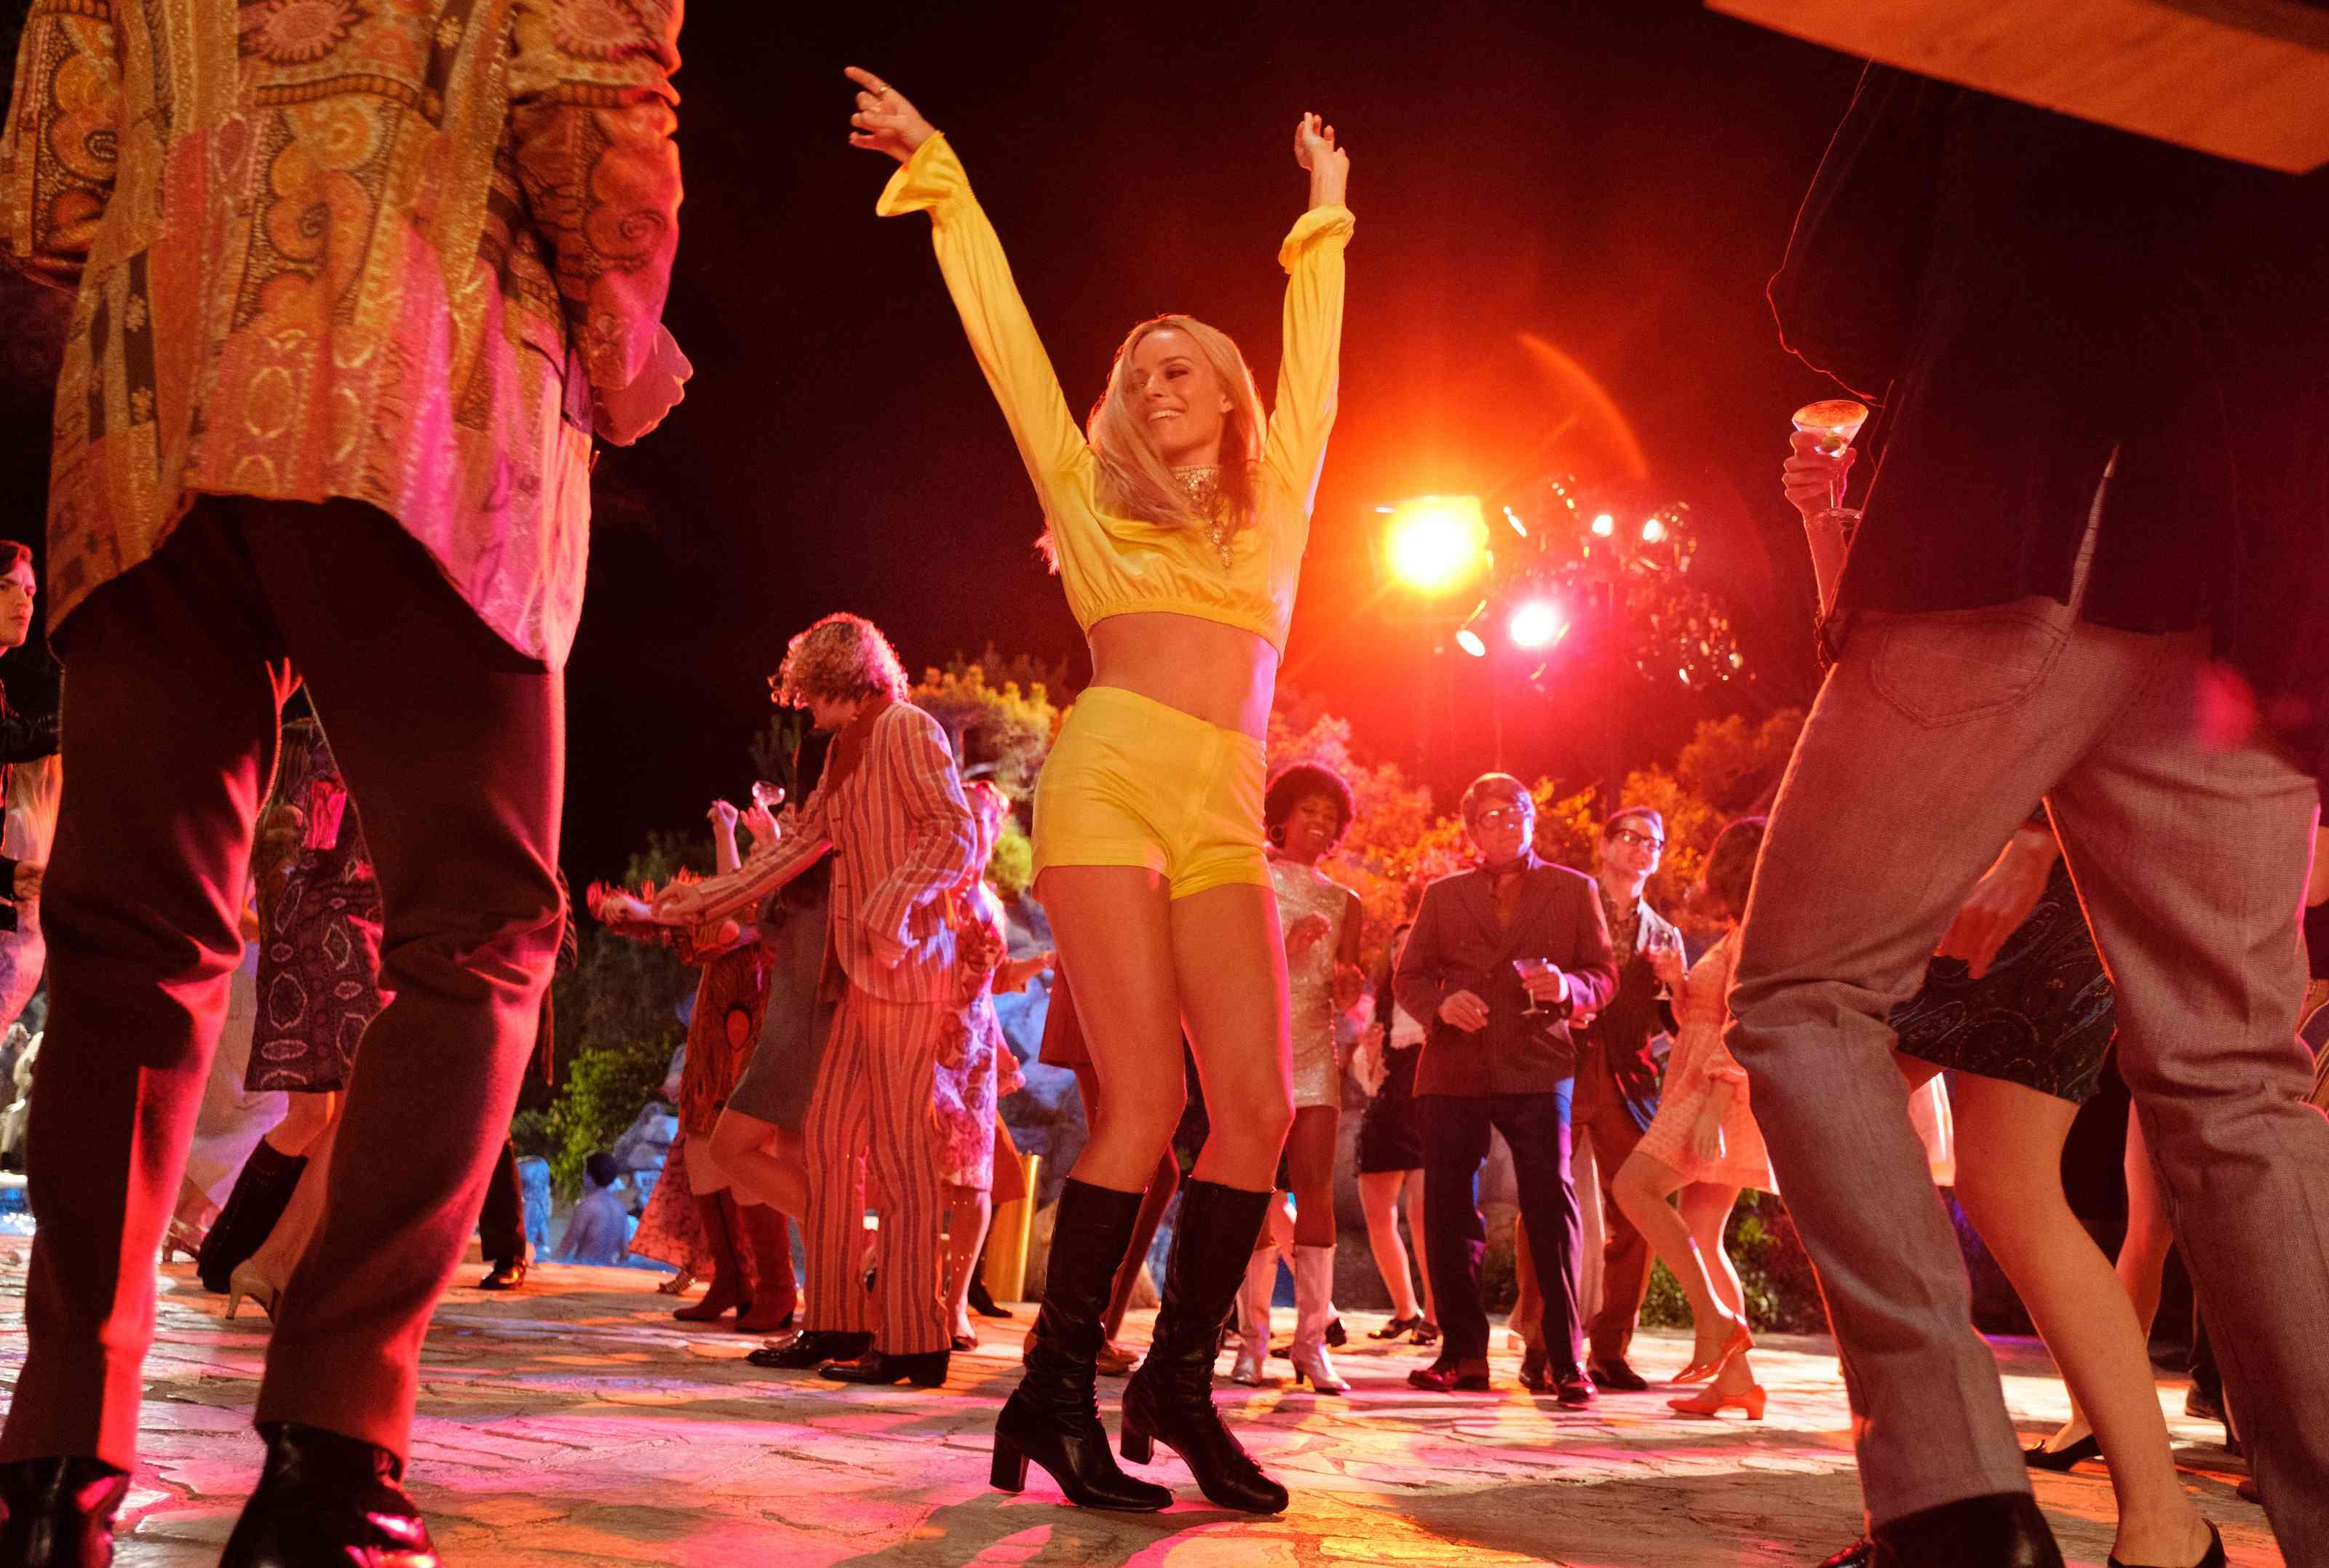 Margot Robbie dancing at the Playboy Mansion